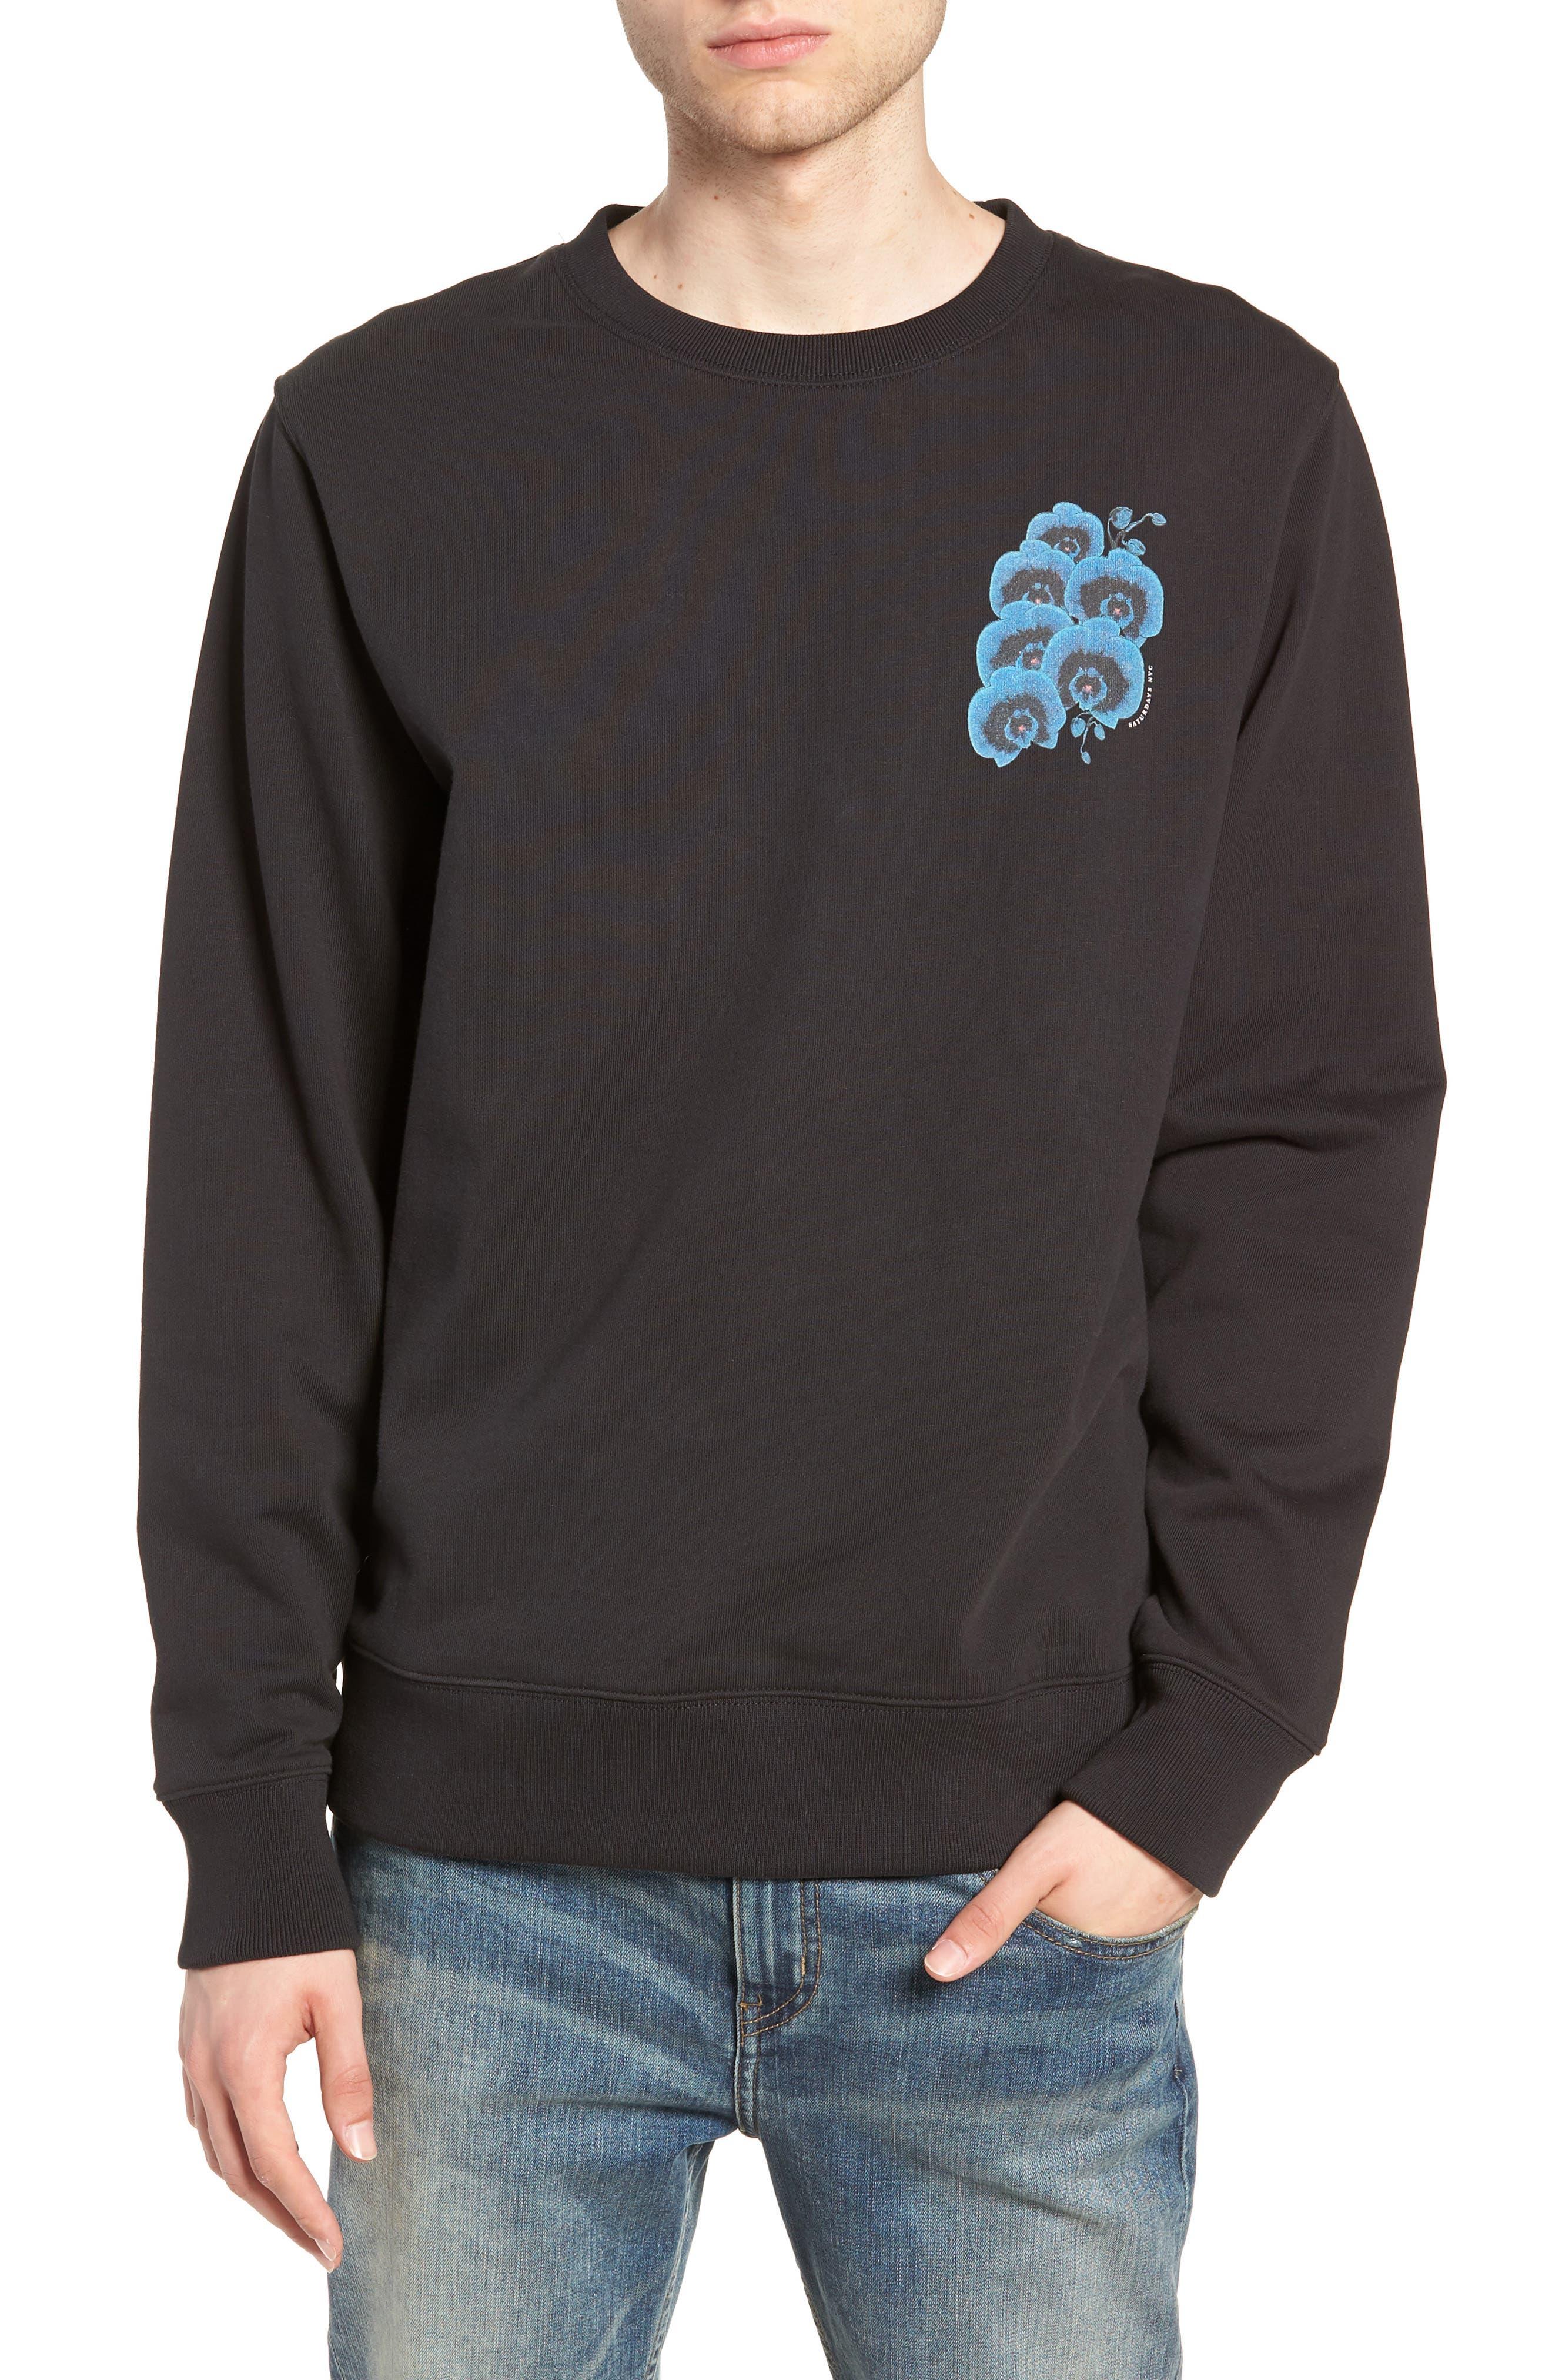 Bowery Orchid Graphic Sweatshirt,                             Main thumbnail 1, color,                             001